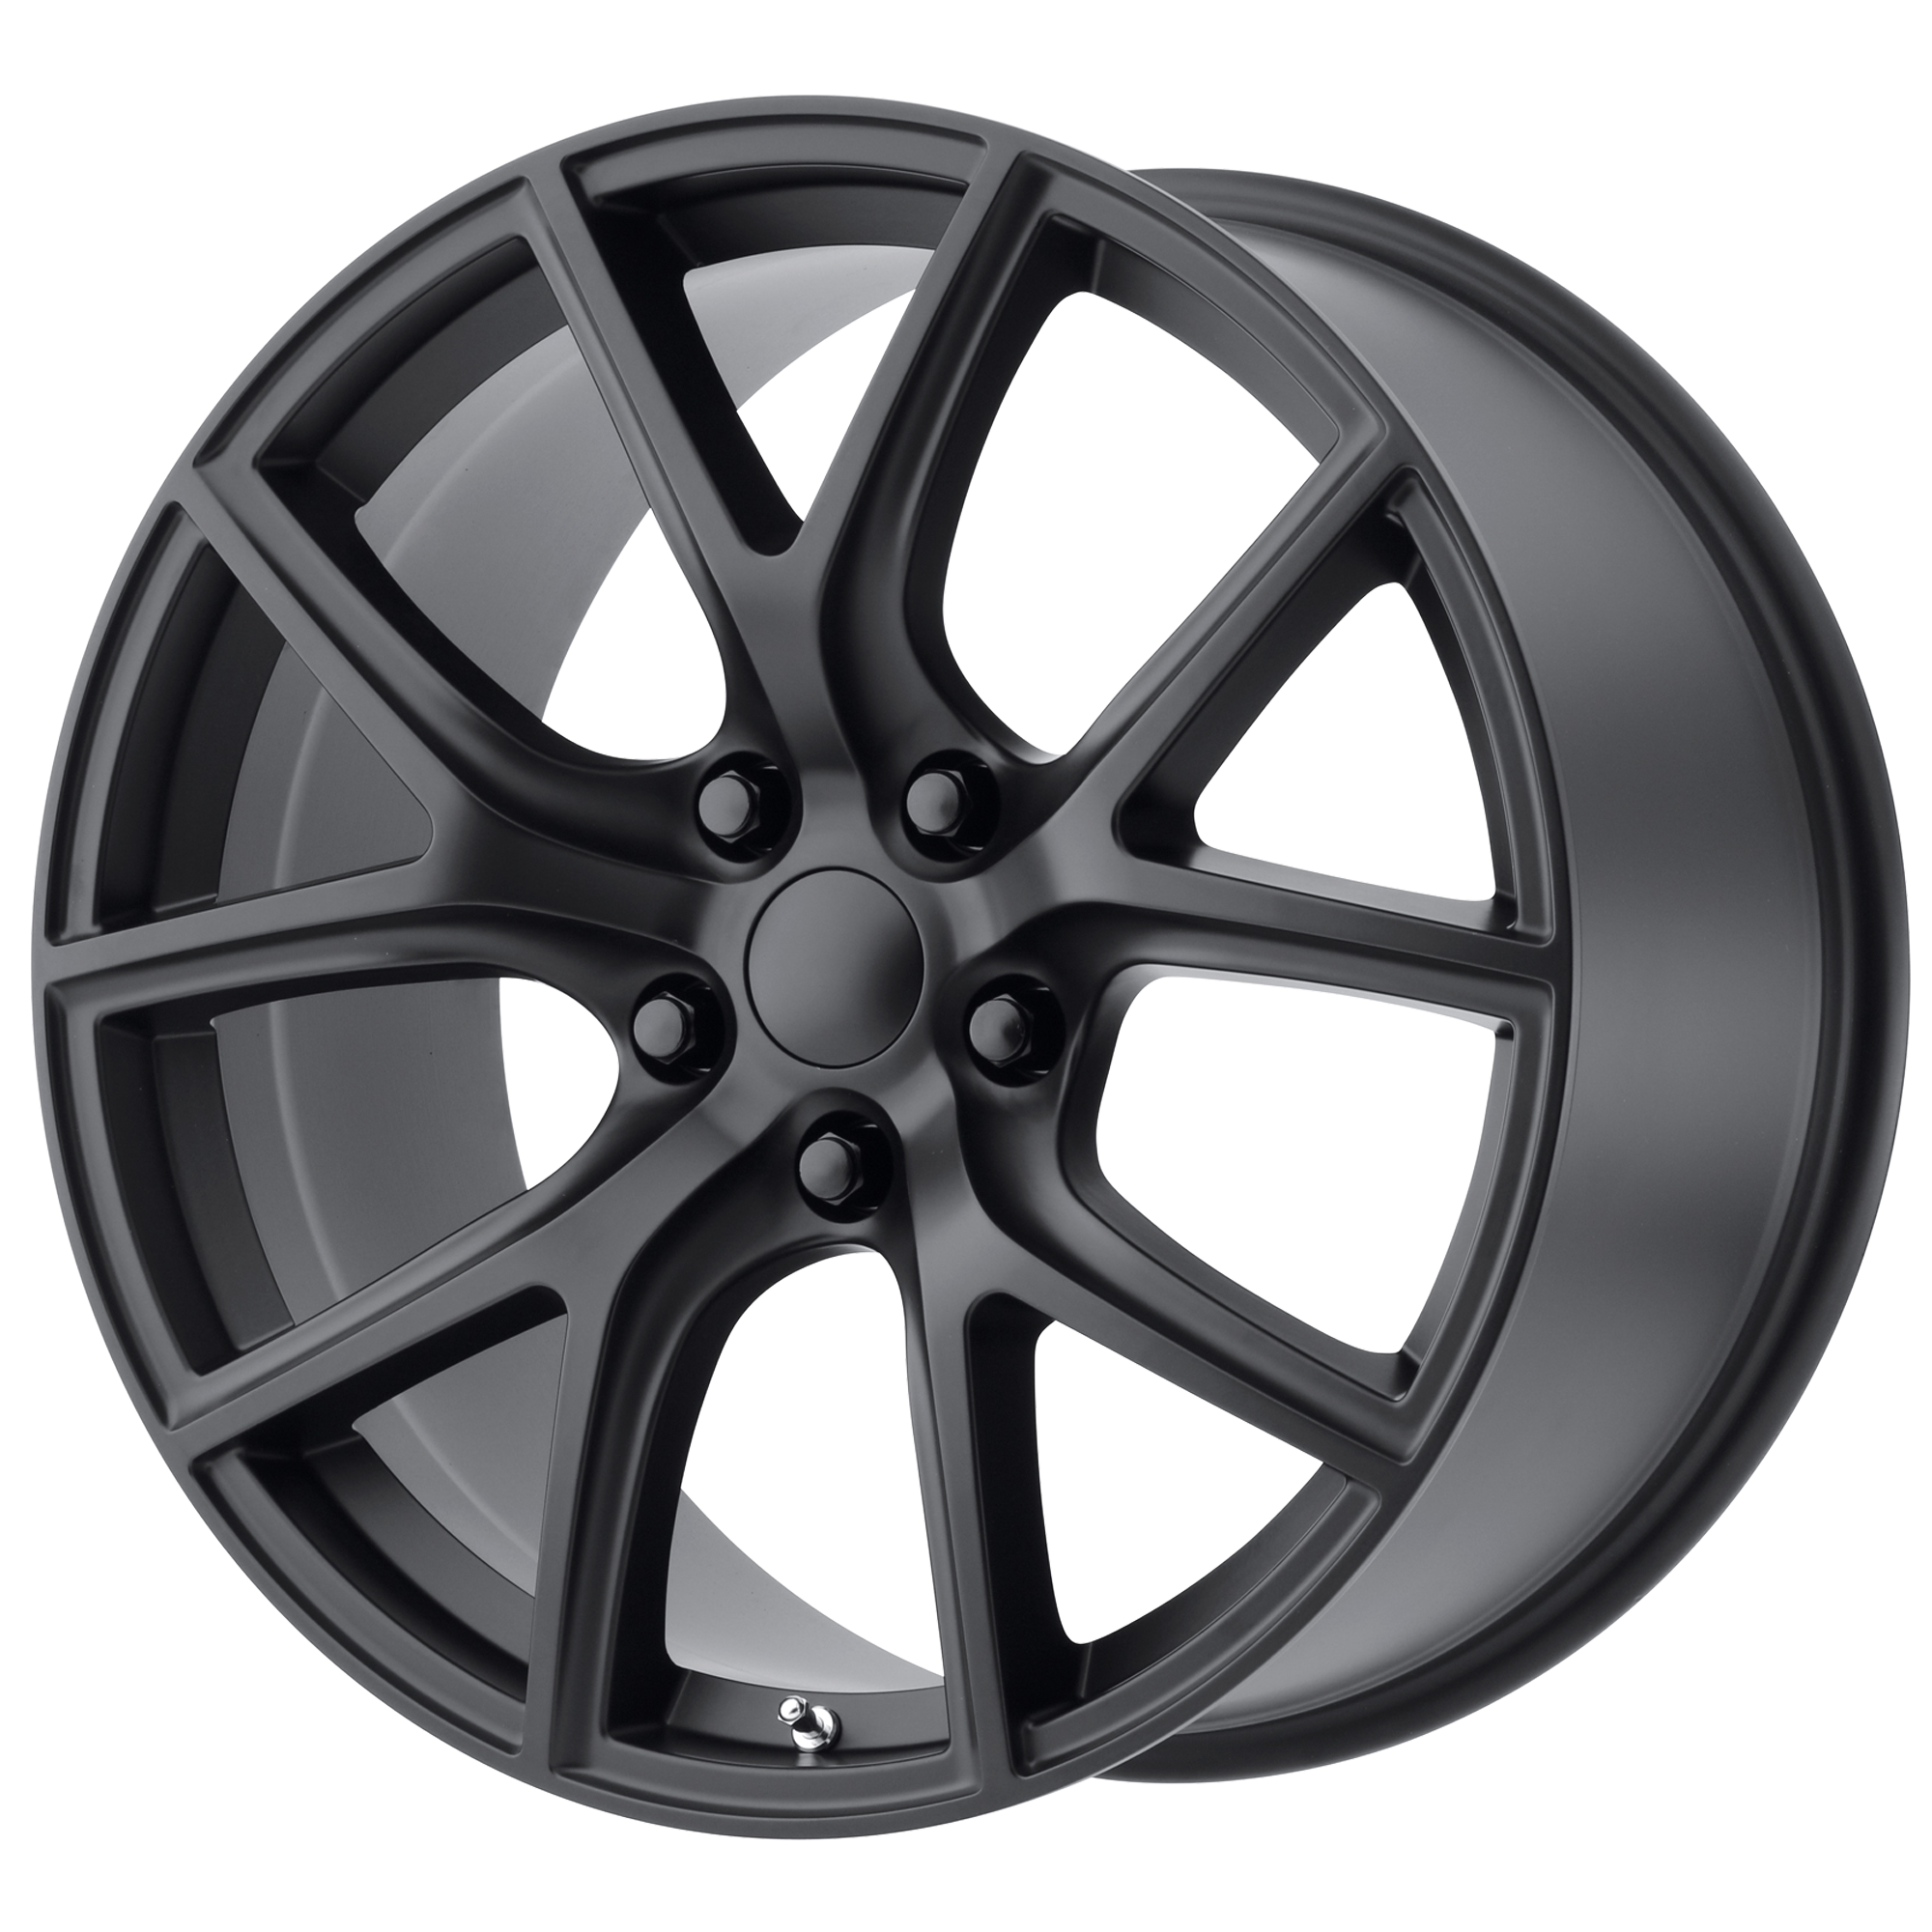 OE Creations Replica Wheels OE Creations PR181 Satin Black